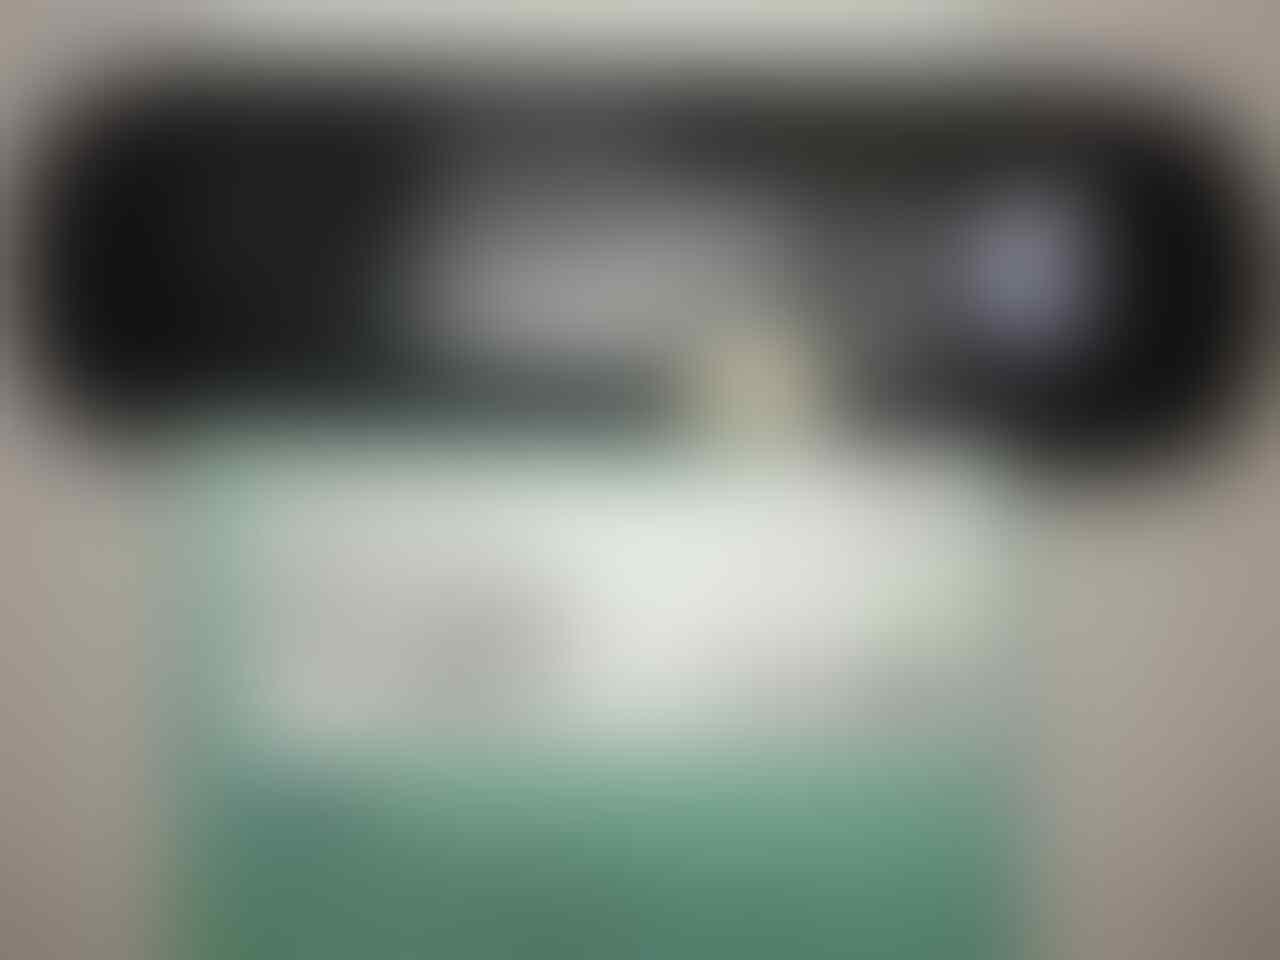 [BANDUNG]CEPAT 21MBPS ZTE MF 190J HSPA+/HSDPA/3G/EDGE MURAH NGEBUT SSH,VPN,PROXY